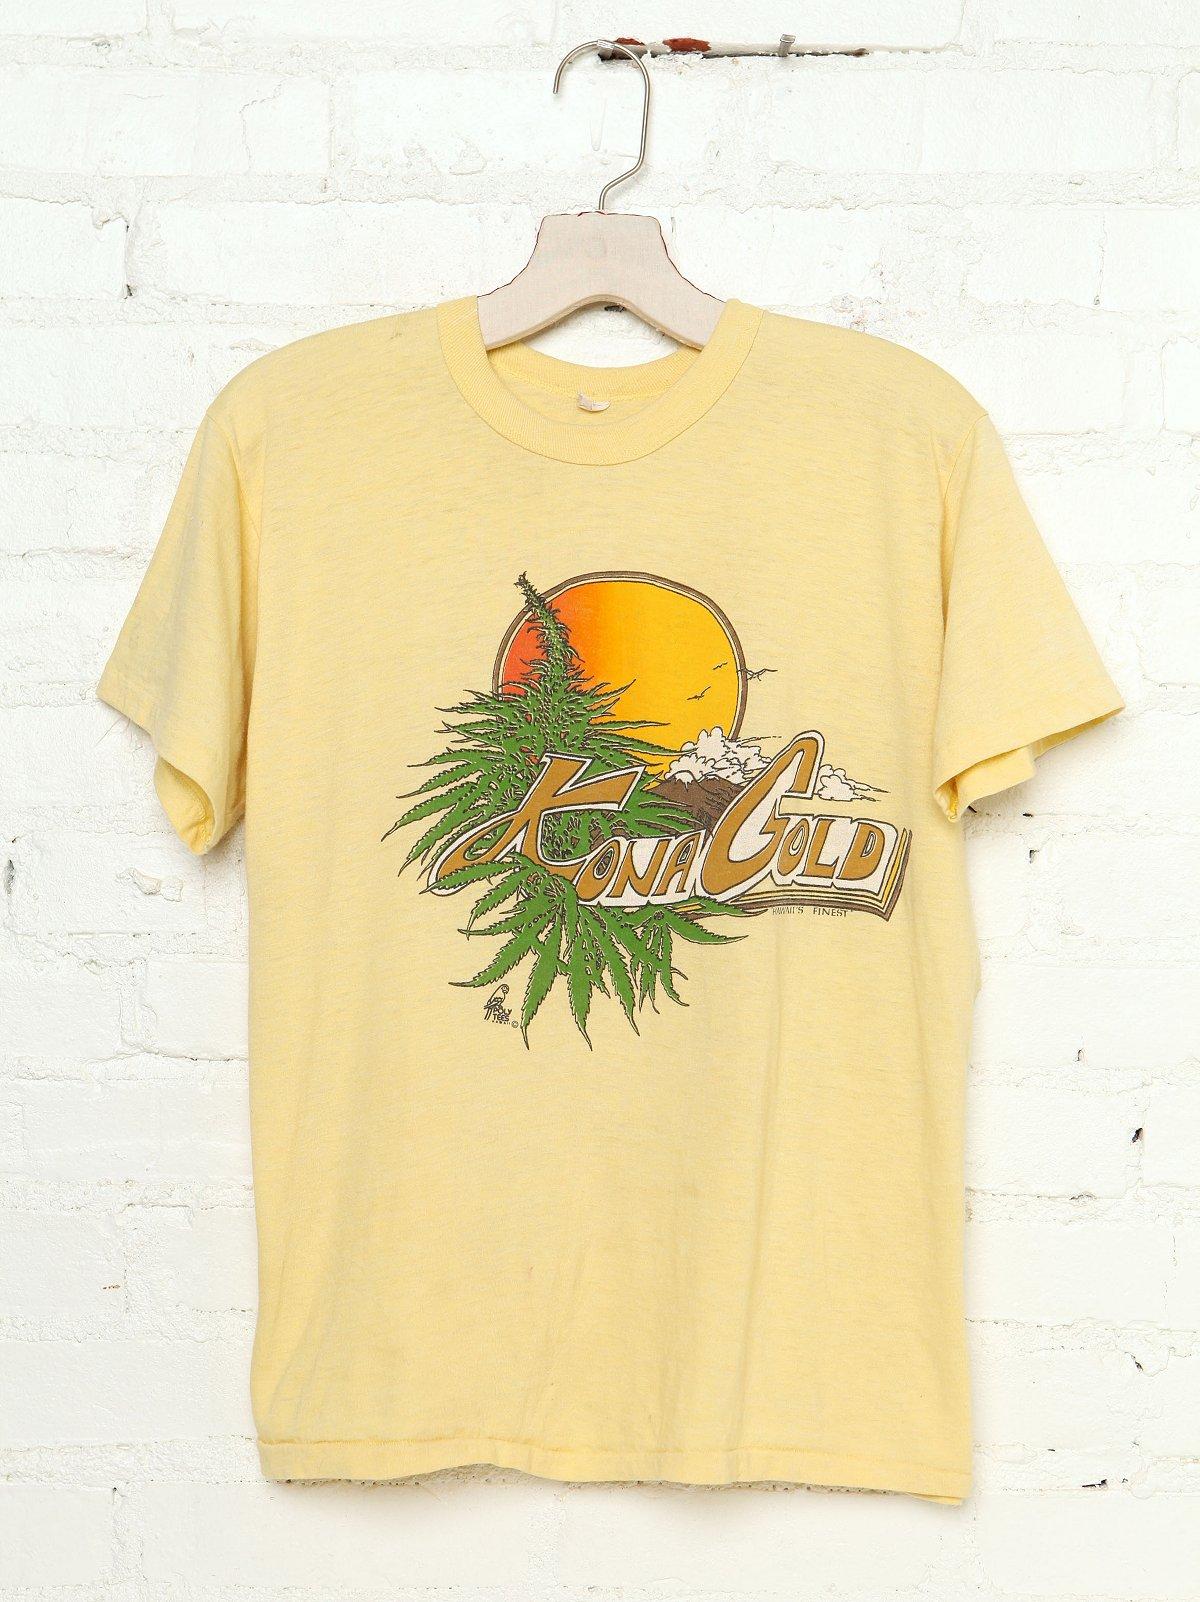 Kona Gold Tee